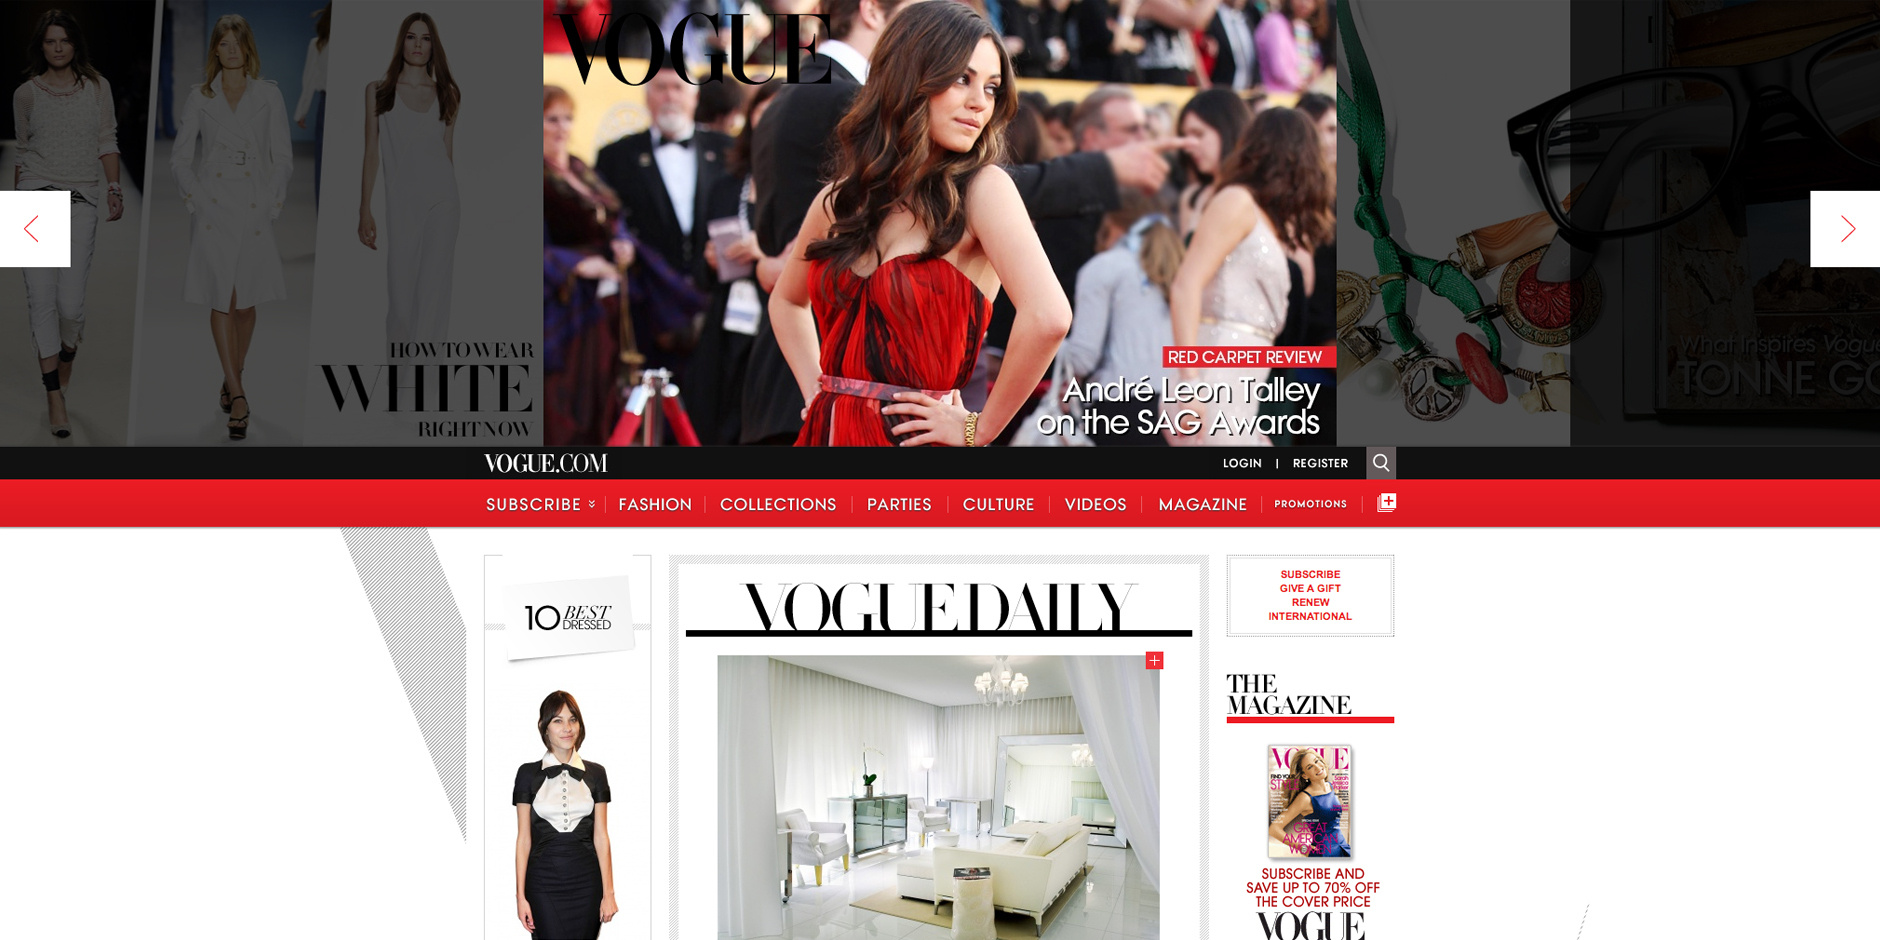 2011 Webby Winner - Vogue.com